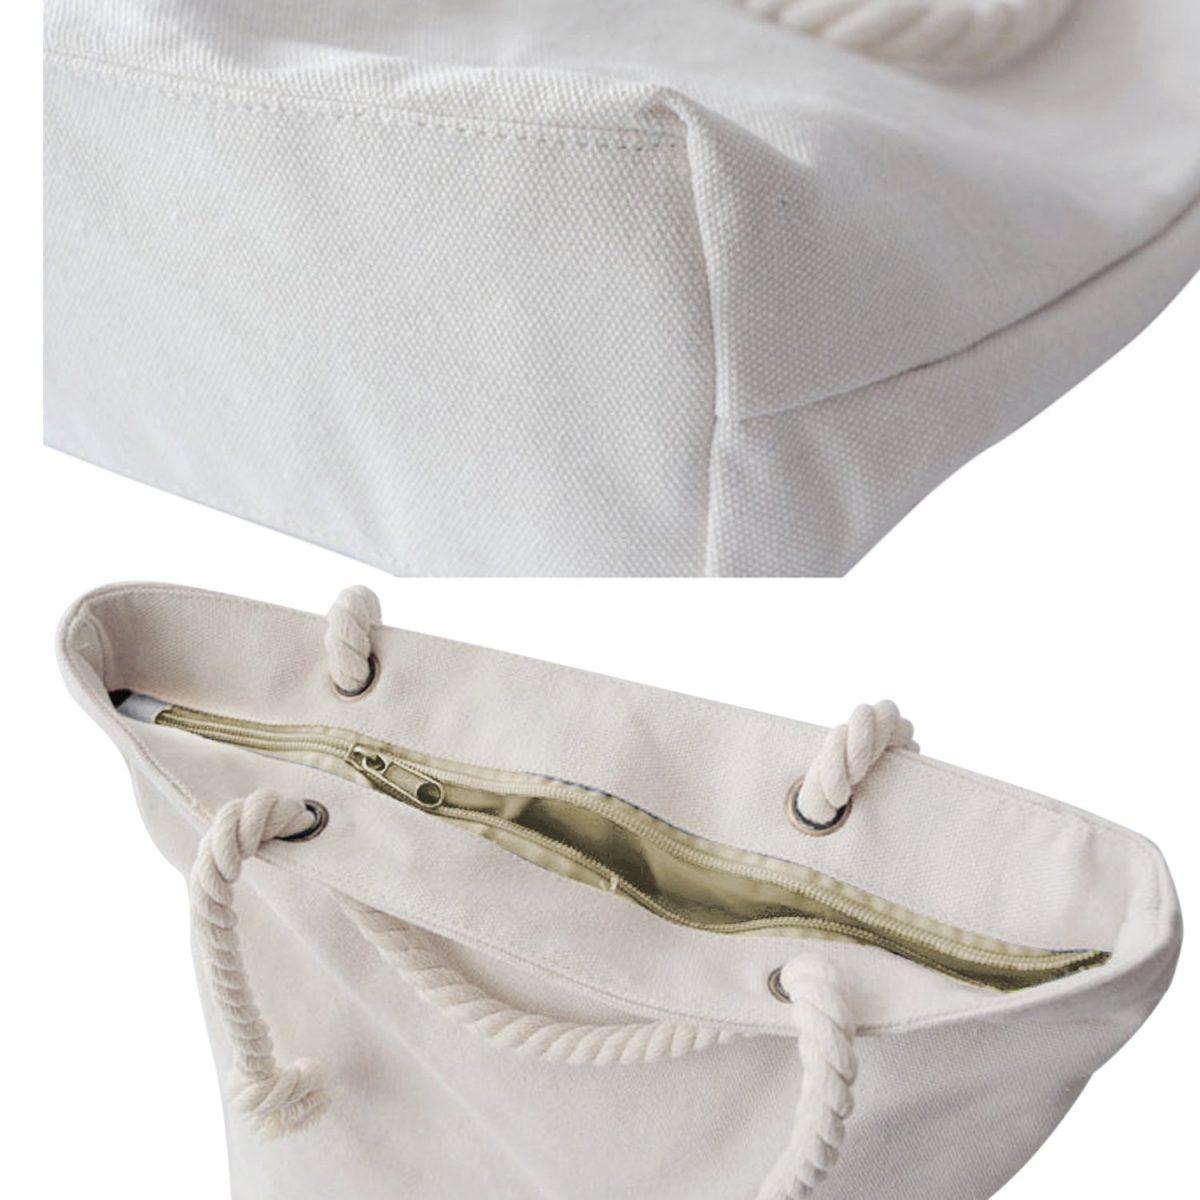 Yatay Temalı Gökkuşağı Puanlı Modern Fermuarlı Kumaş Çanta Realhomes